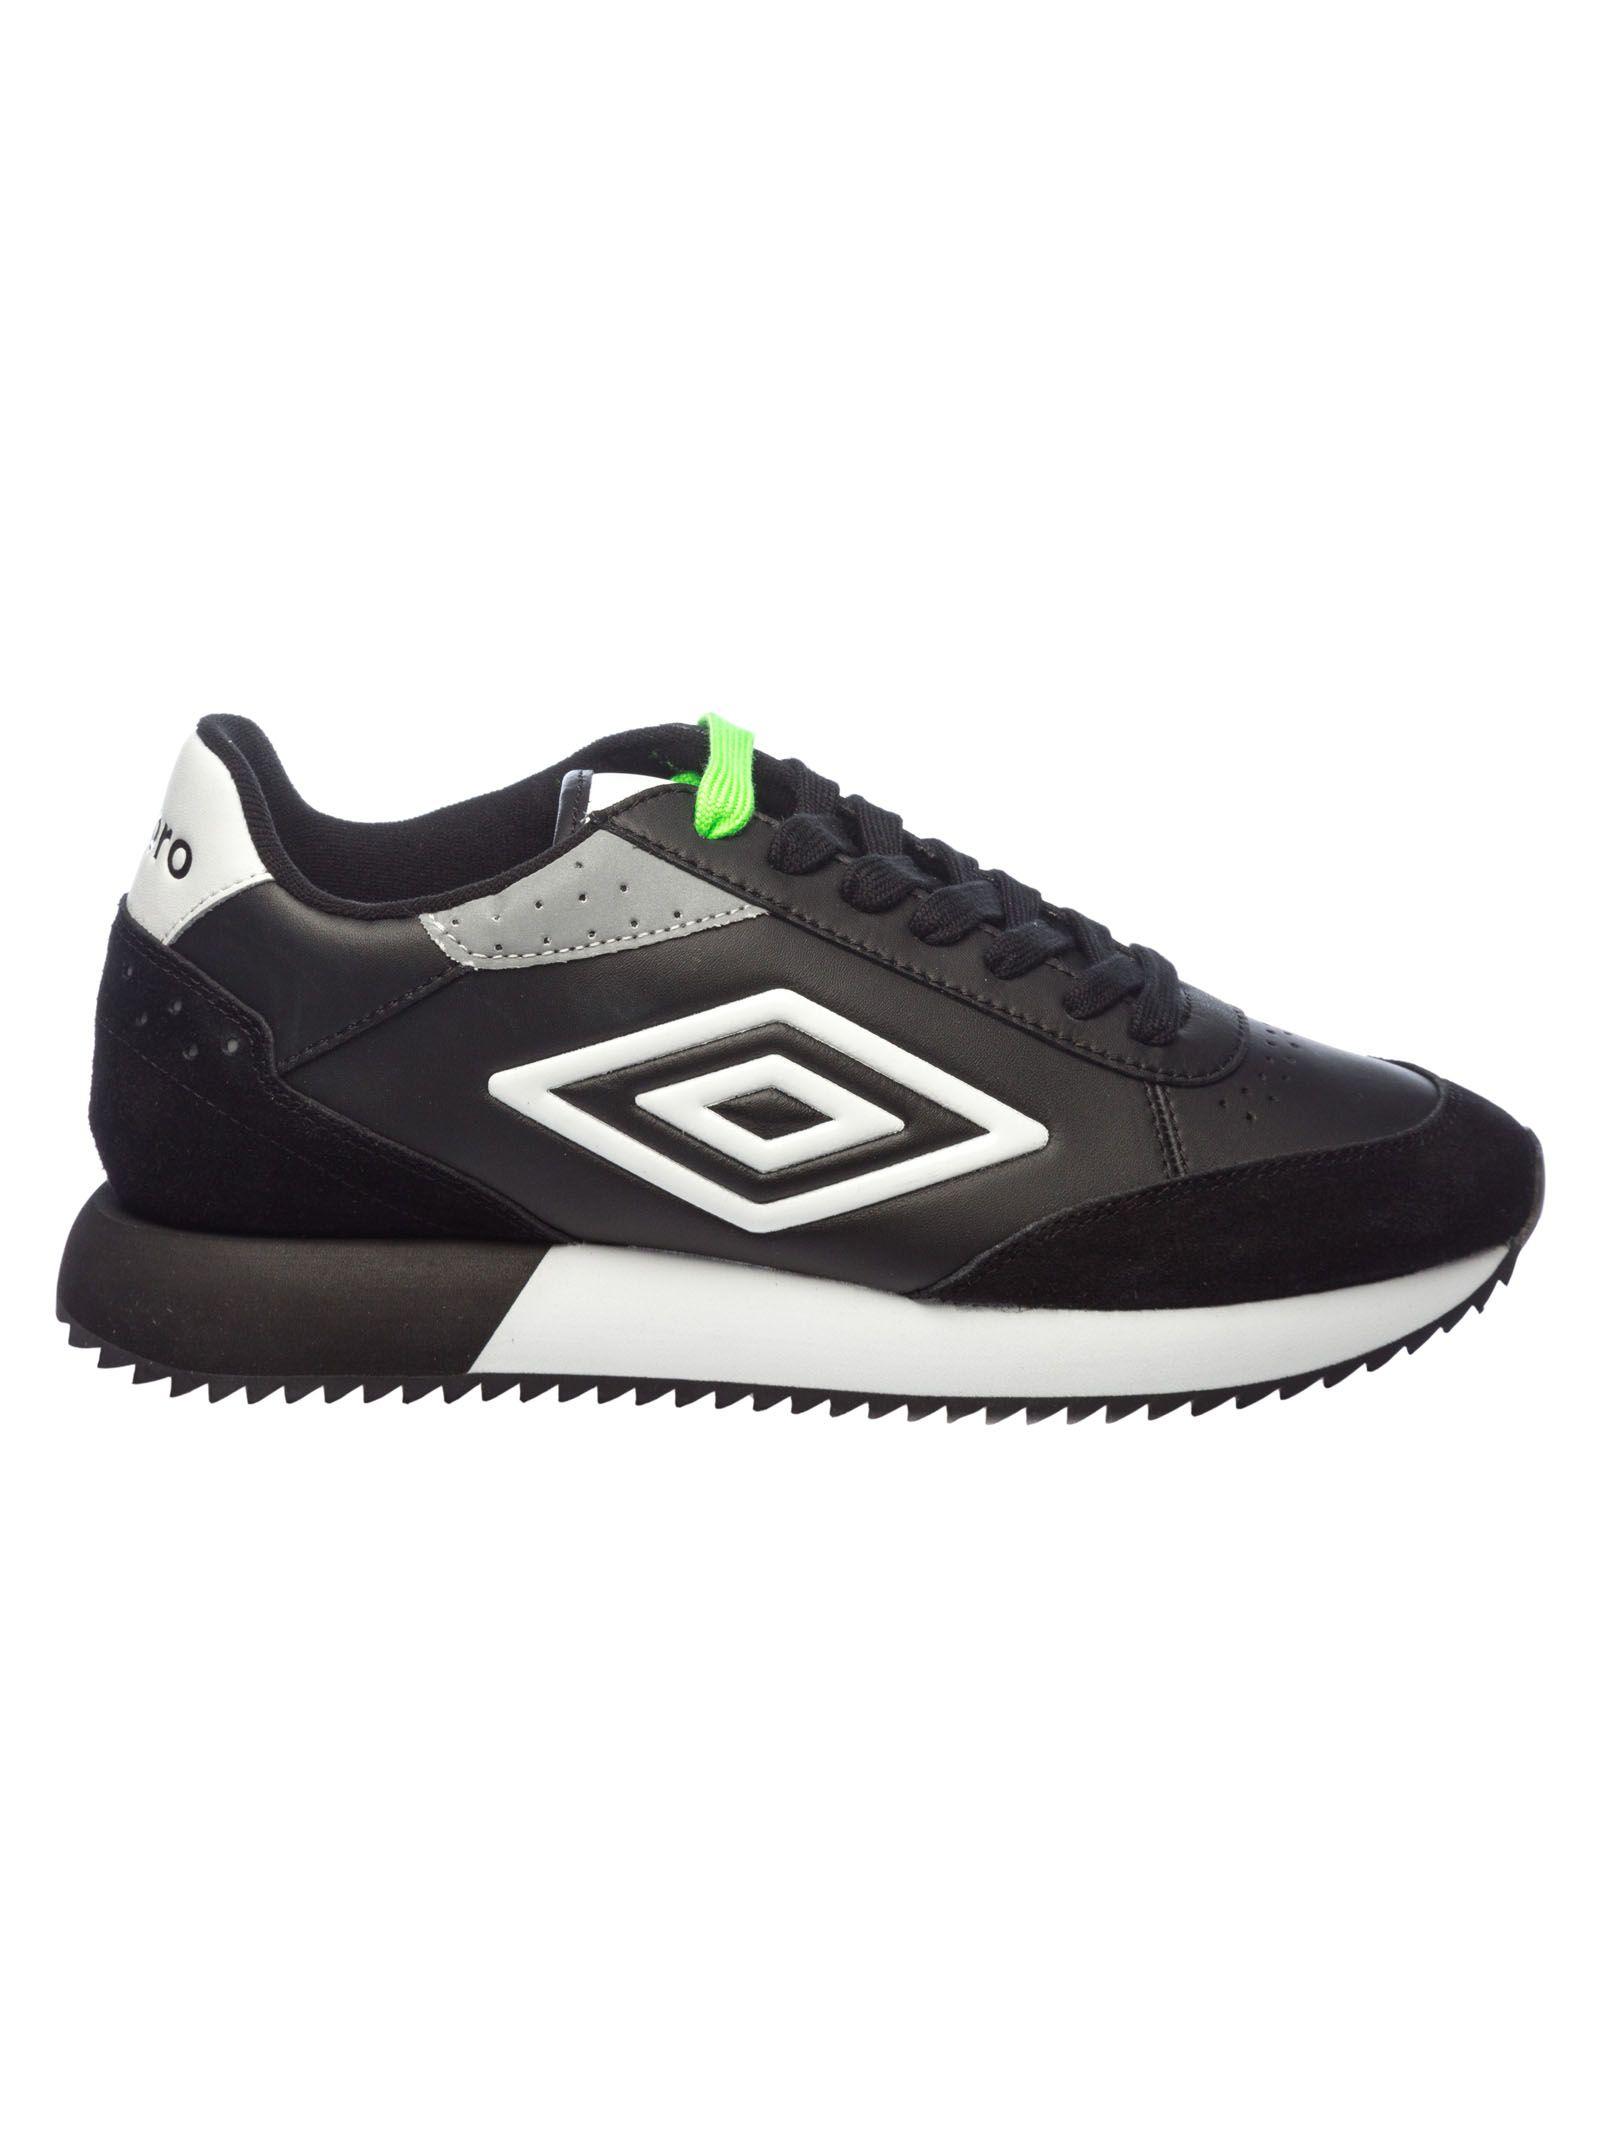 UMBRO Classic Running Sneakers in Black/White